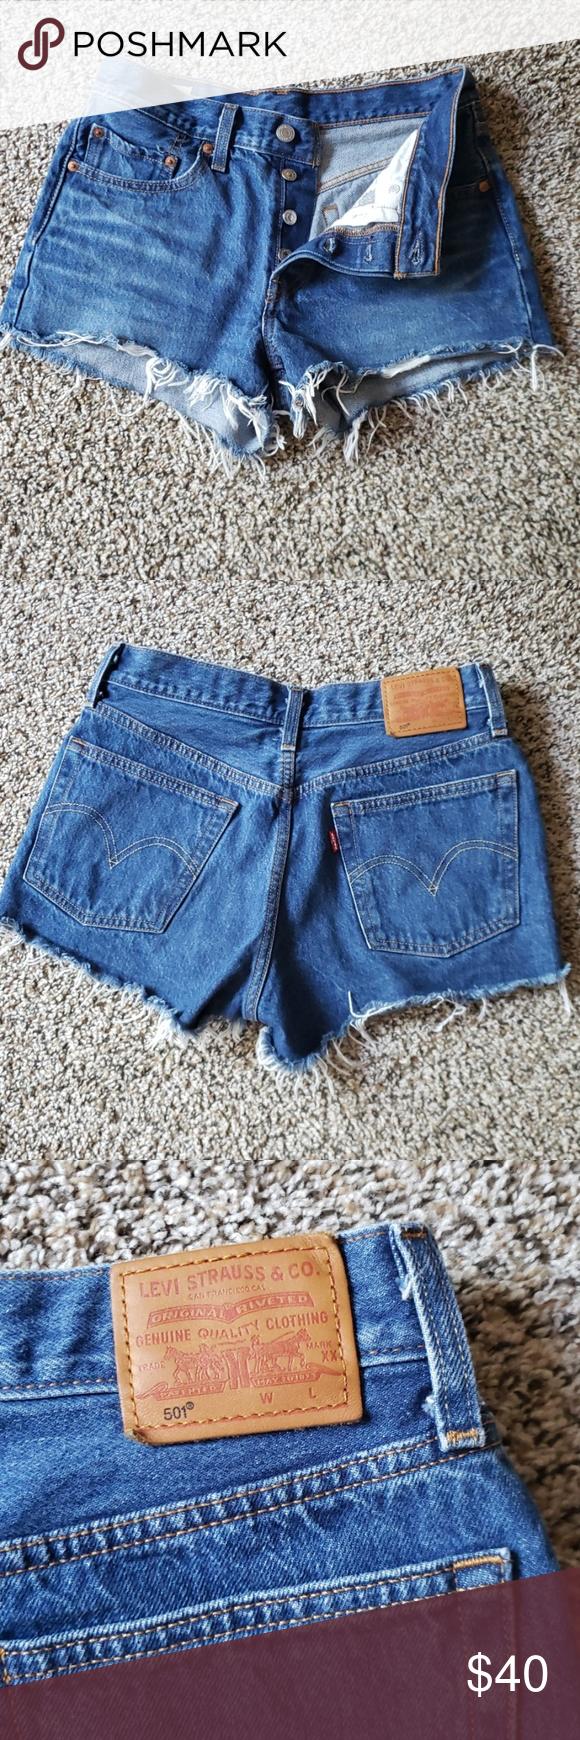 Levi 501 denim cutoff shorts Only worn once, like new, Levi 501 cutoffs. Levi's Shorts Jean Shorts #denimcutoffshorts